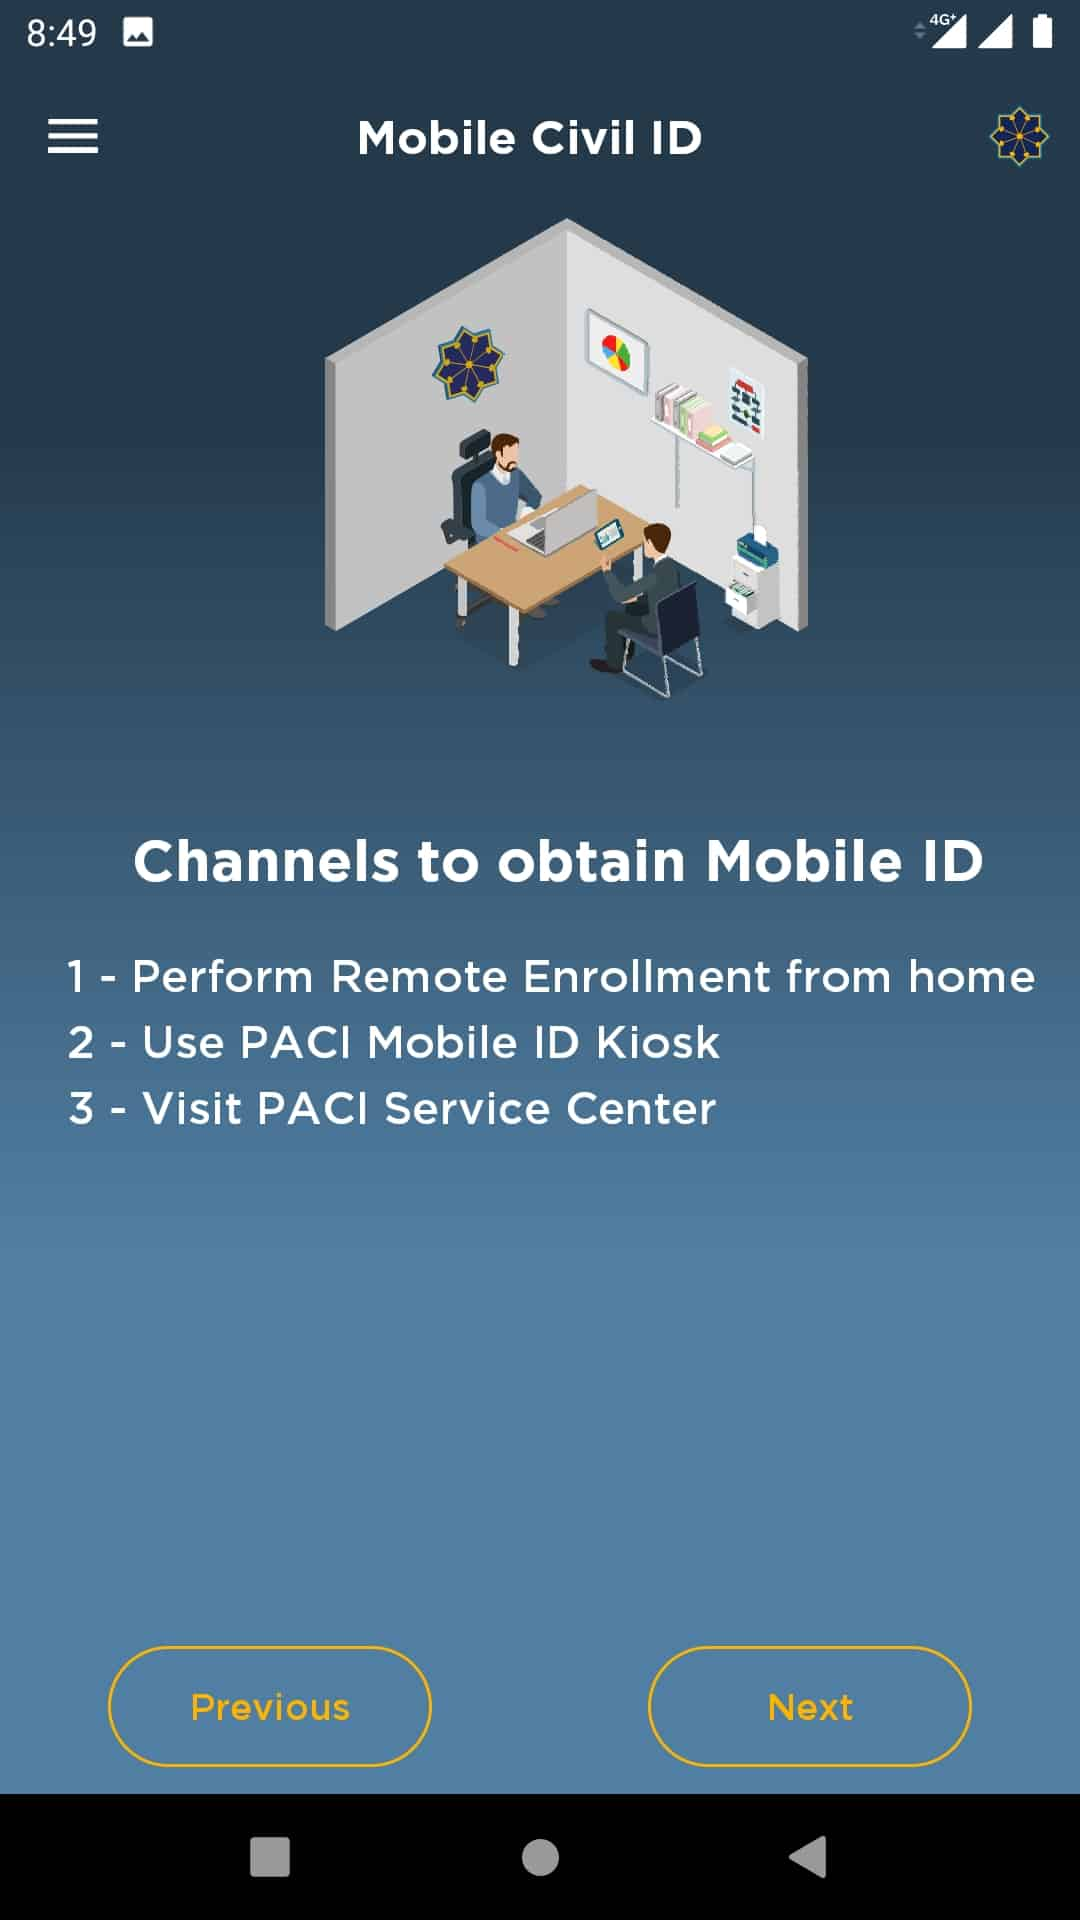 Activate Digital Civil ID, Kuwait Civil ID on Mobile or Tab, iiQ8, PACI 2